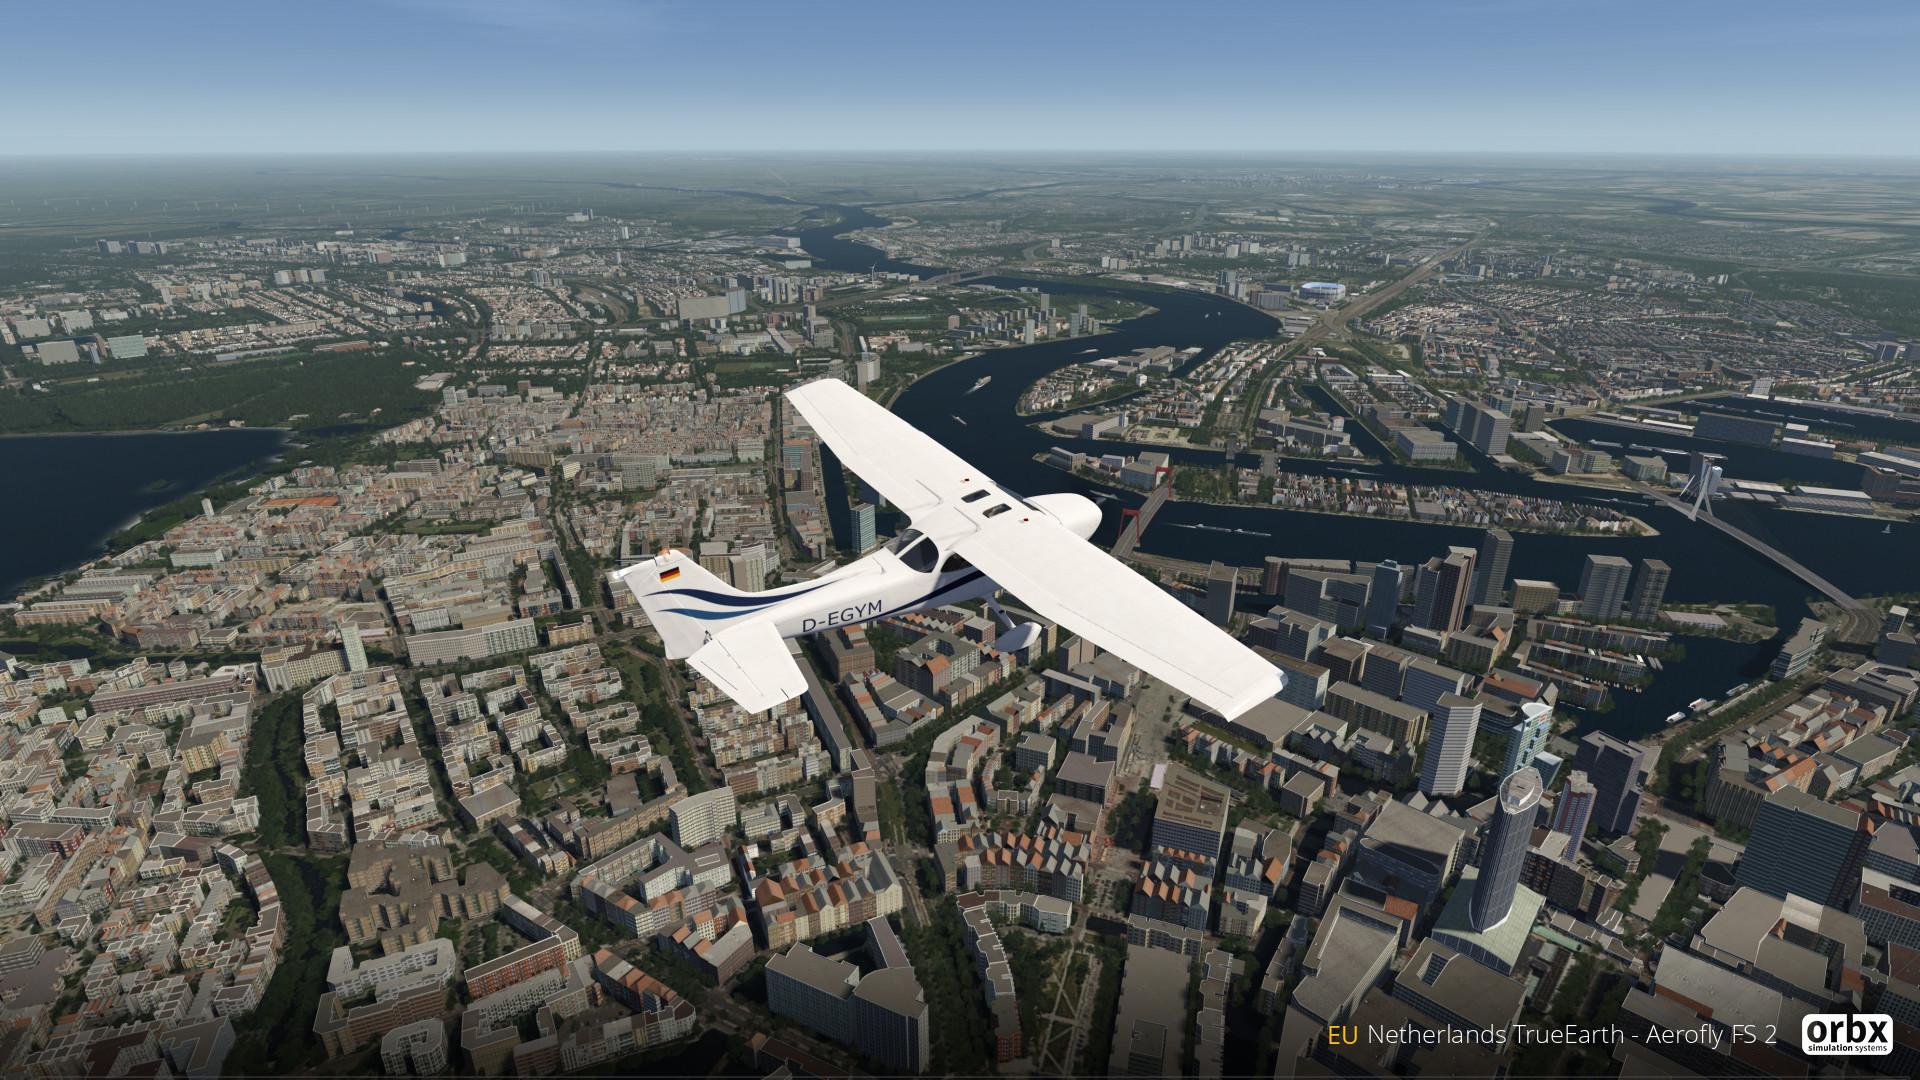 Aerofly FS 2 - Orbx - Netherlands TrueEarth